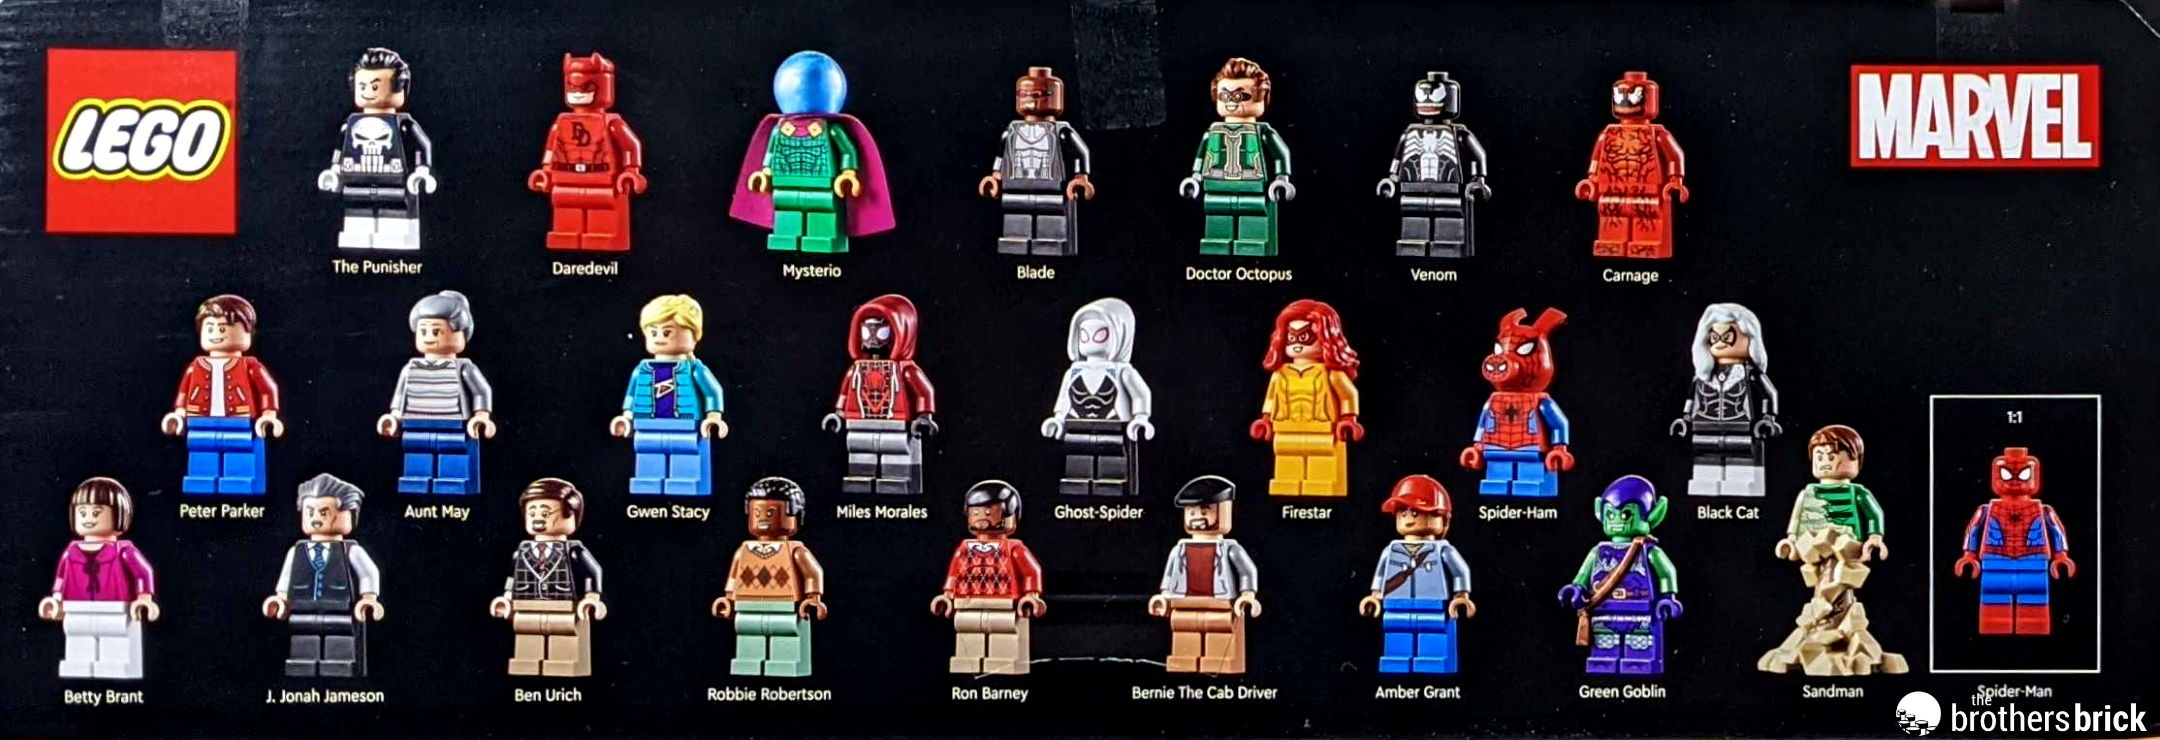 Announced a Lego set like Cillop